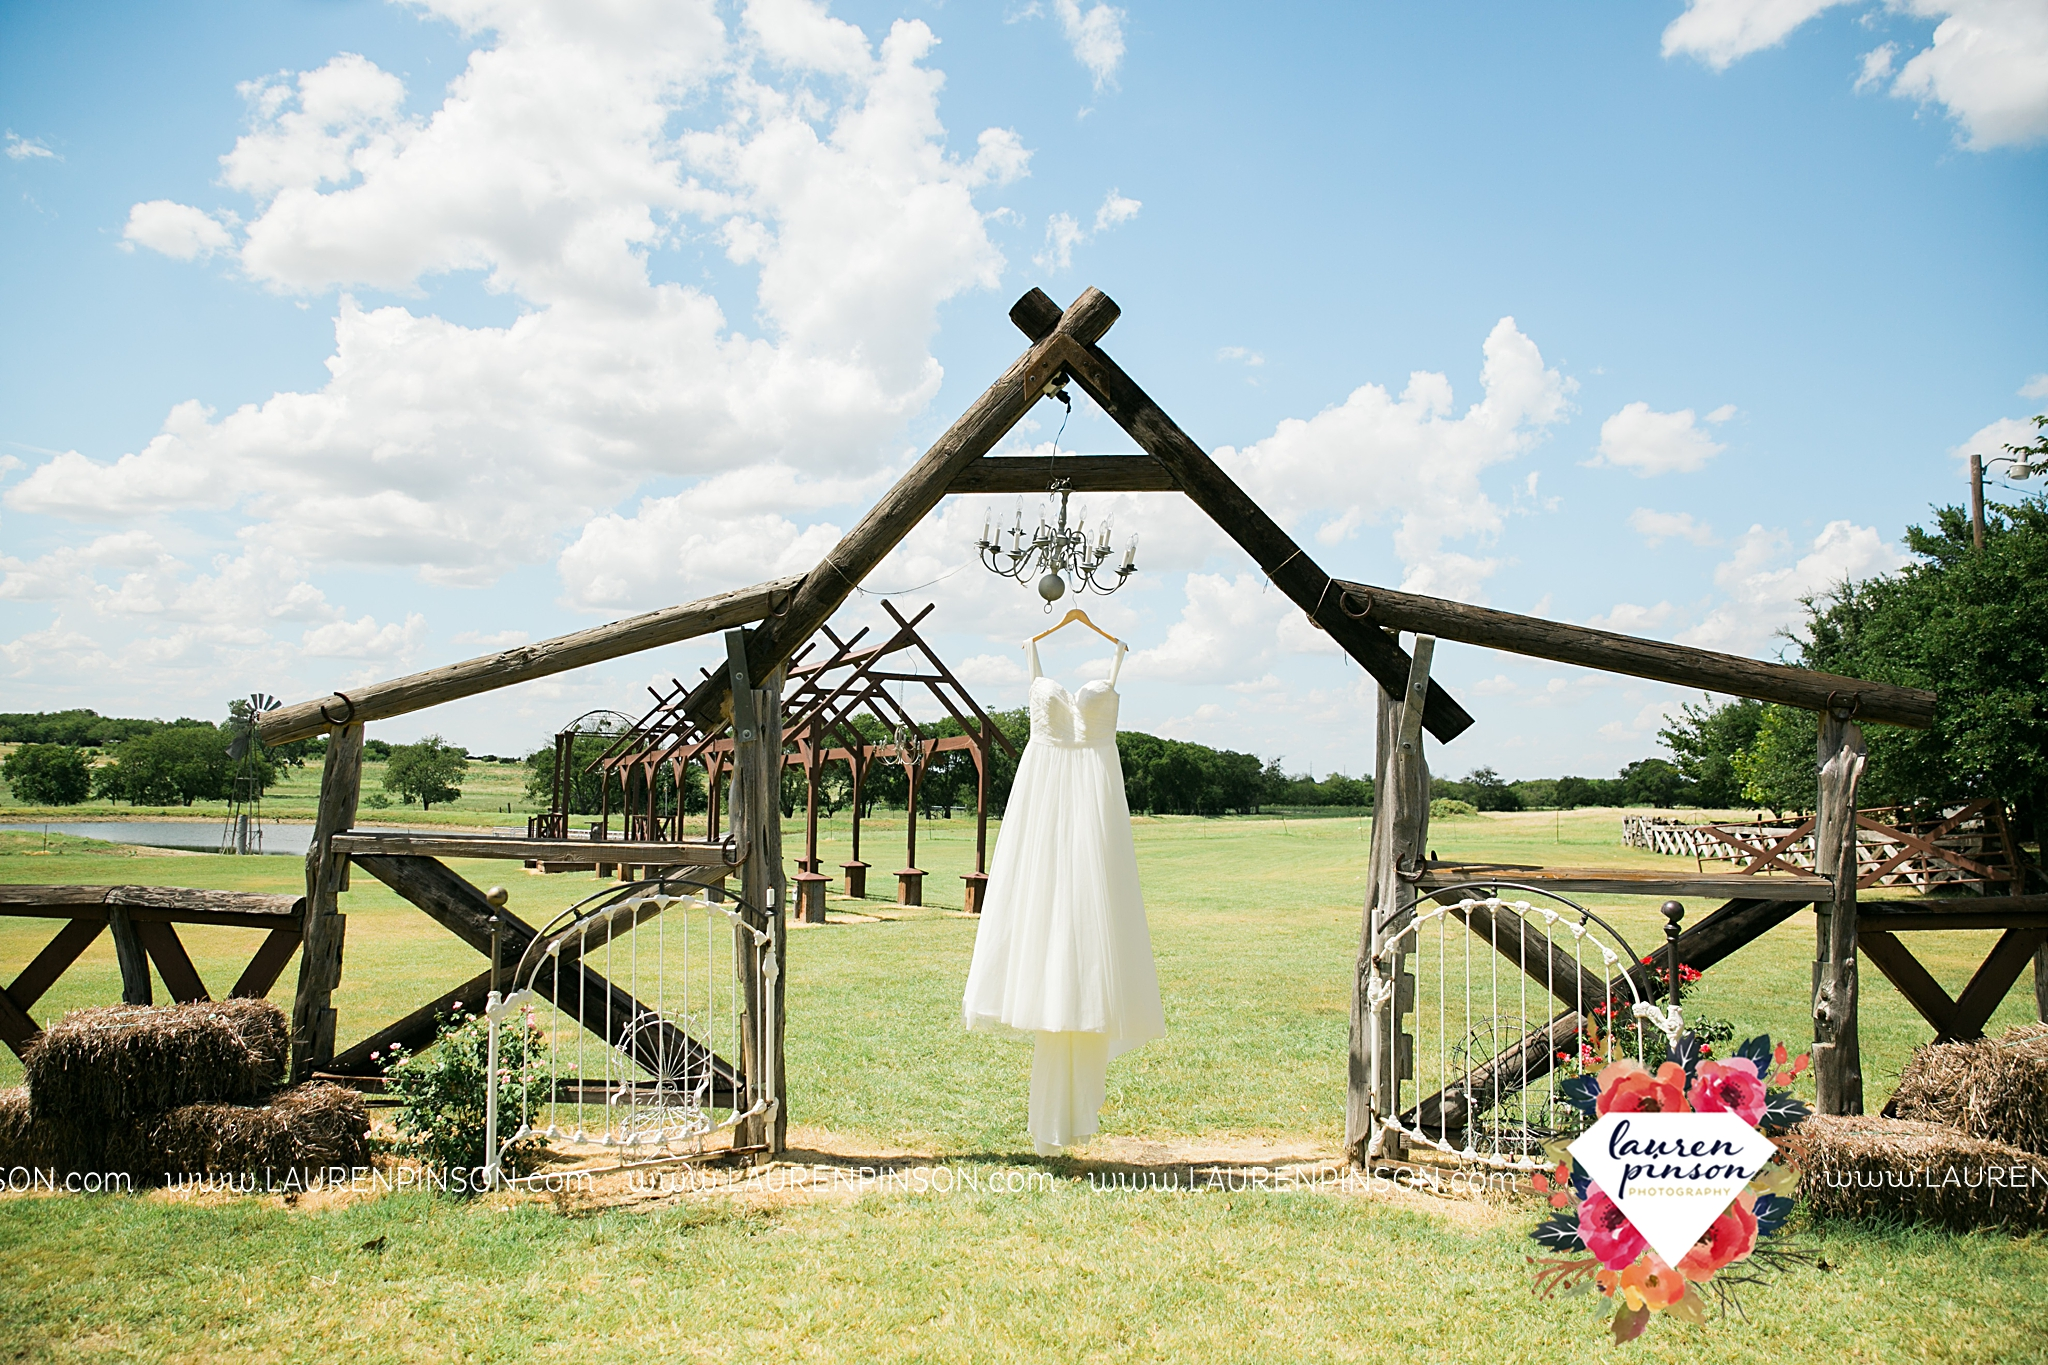 jones-barn-willow-creek-ranch-wedding-in-cleburne-texas-fort-worth-dfw-wichita-falls-wedding-photography_3184.jpg